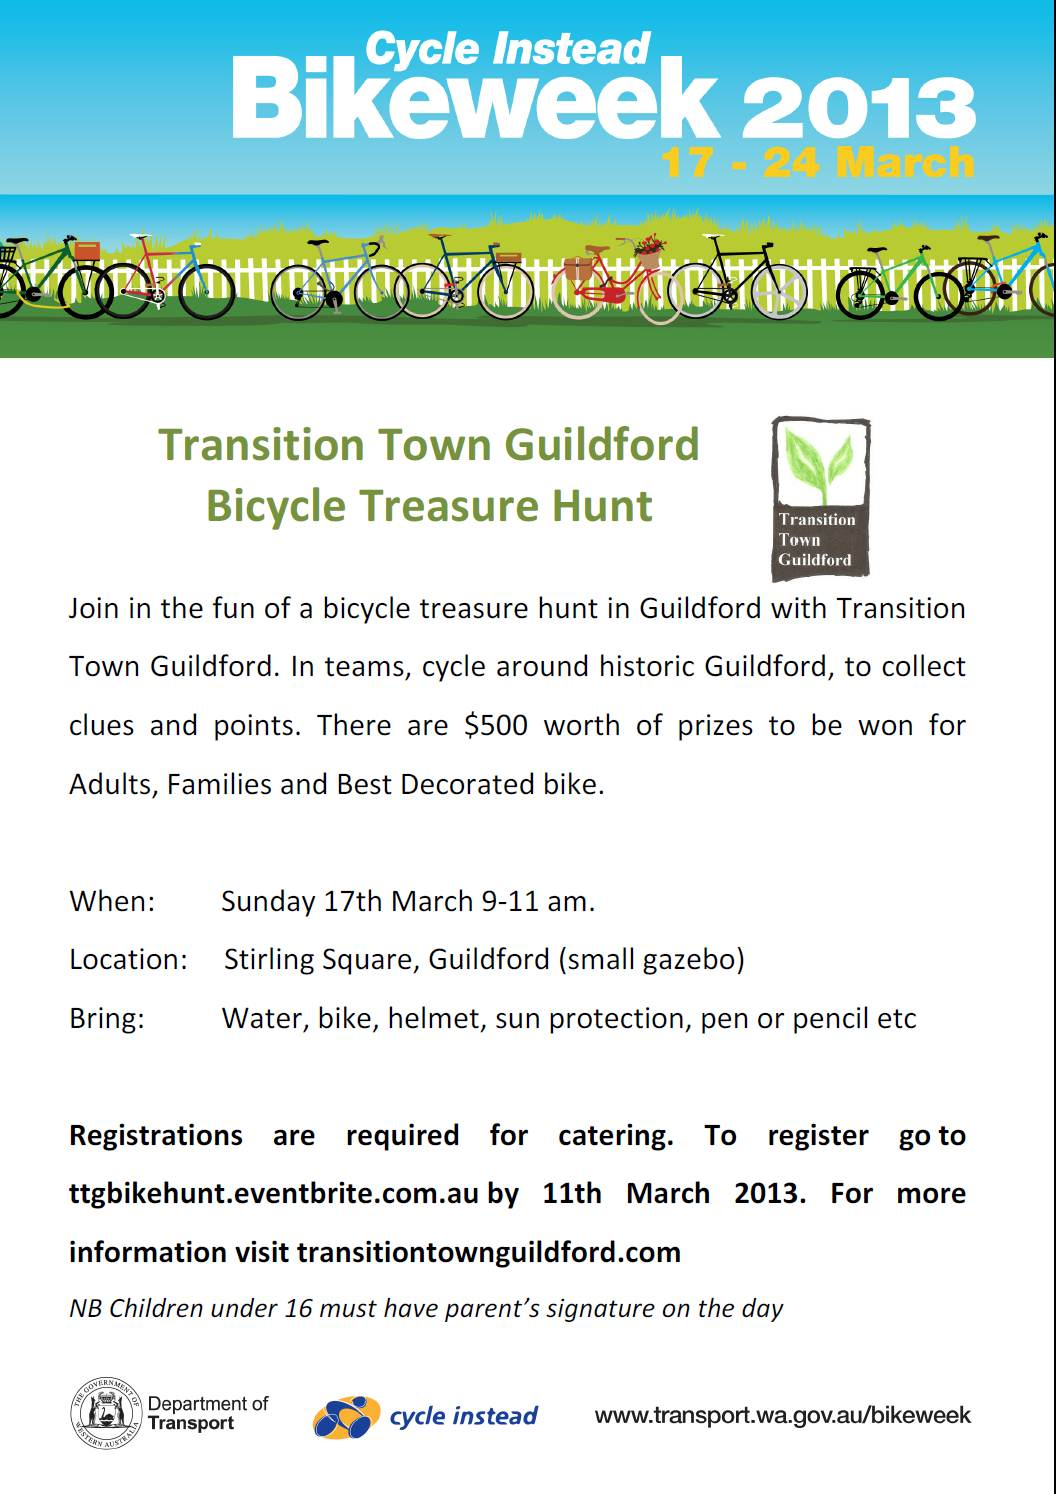 Poster of bike event details